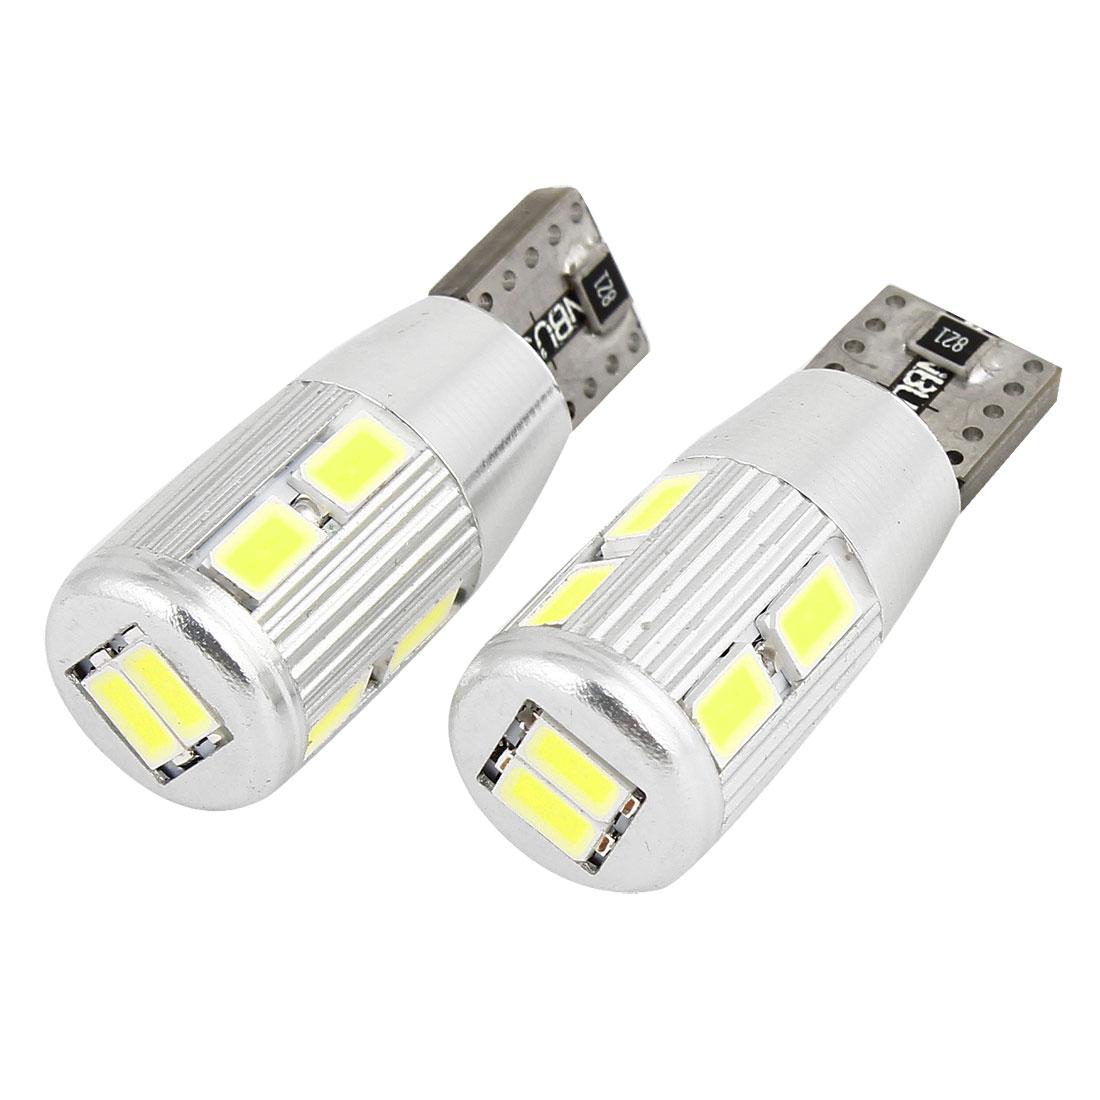 2 Pcs Car T10 147 White 5630 SMD 10 LED Wedge Light Canbus Signal Turn Lamp Bulb internal